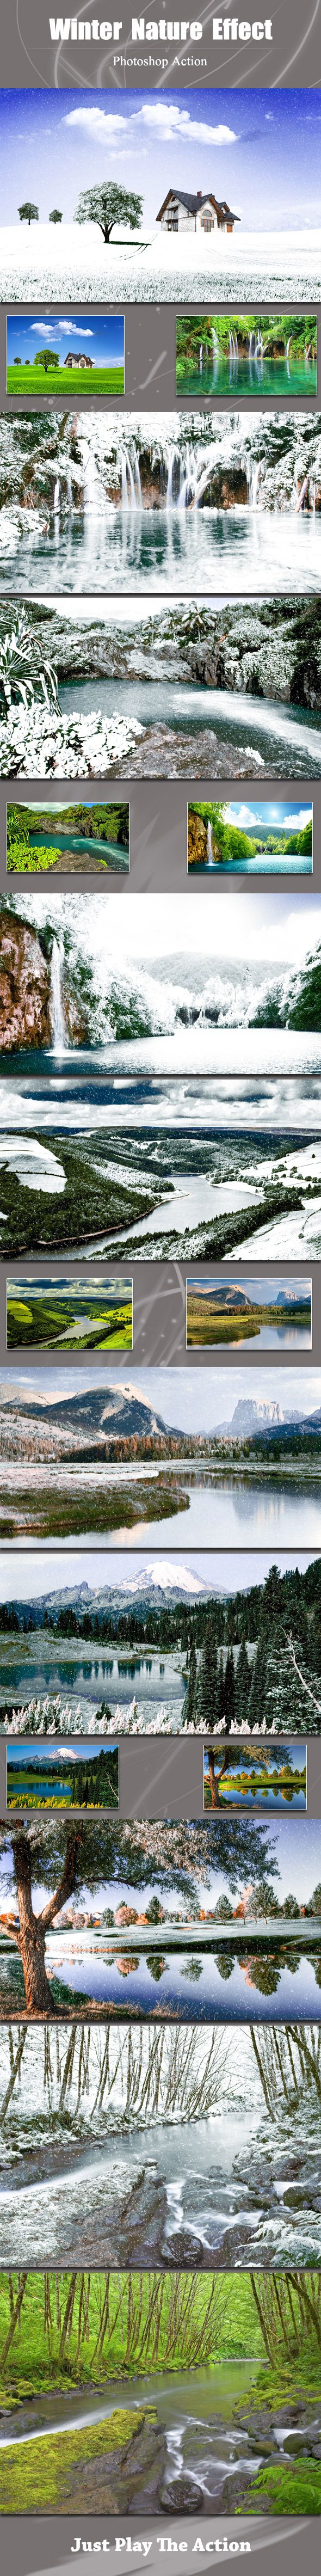 Winter Nature Photo Effect Photoshop Action